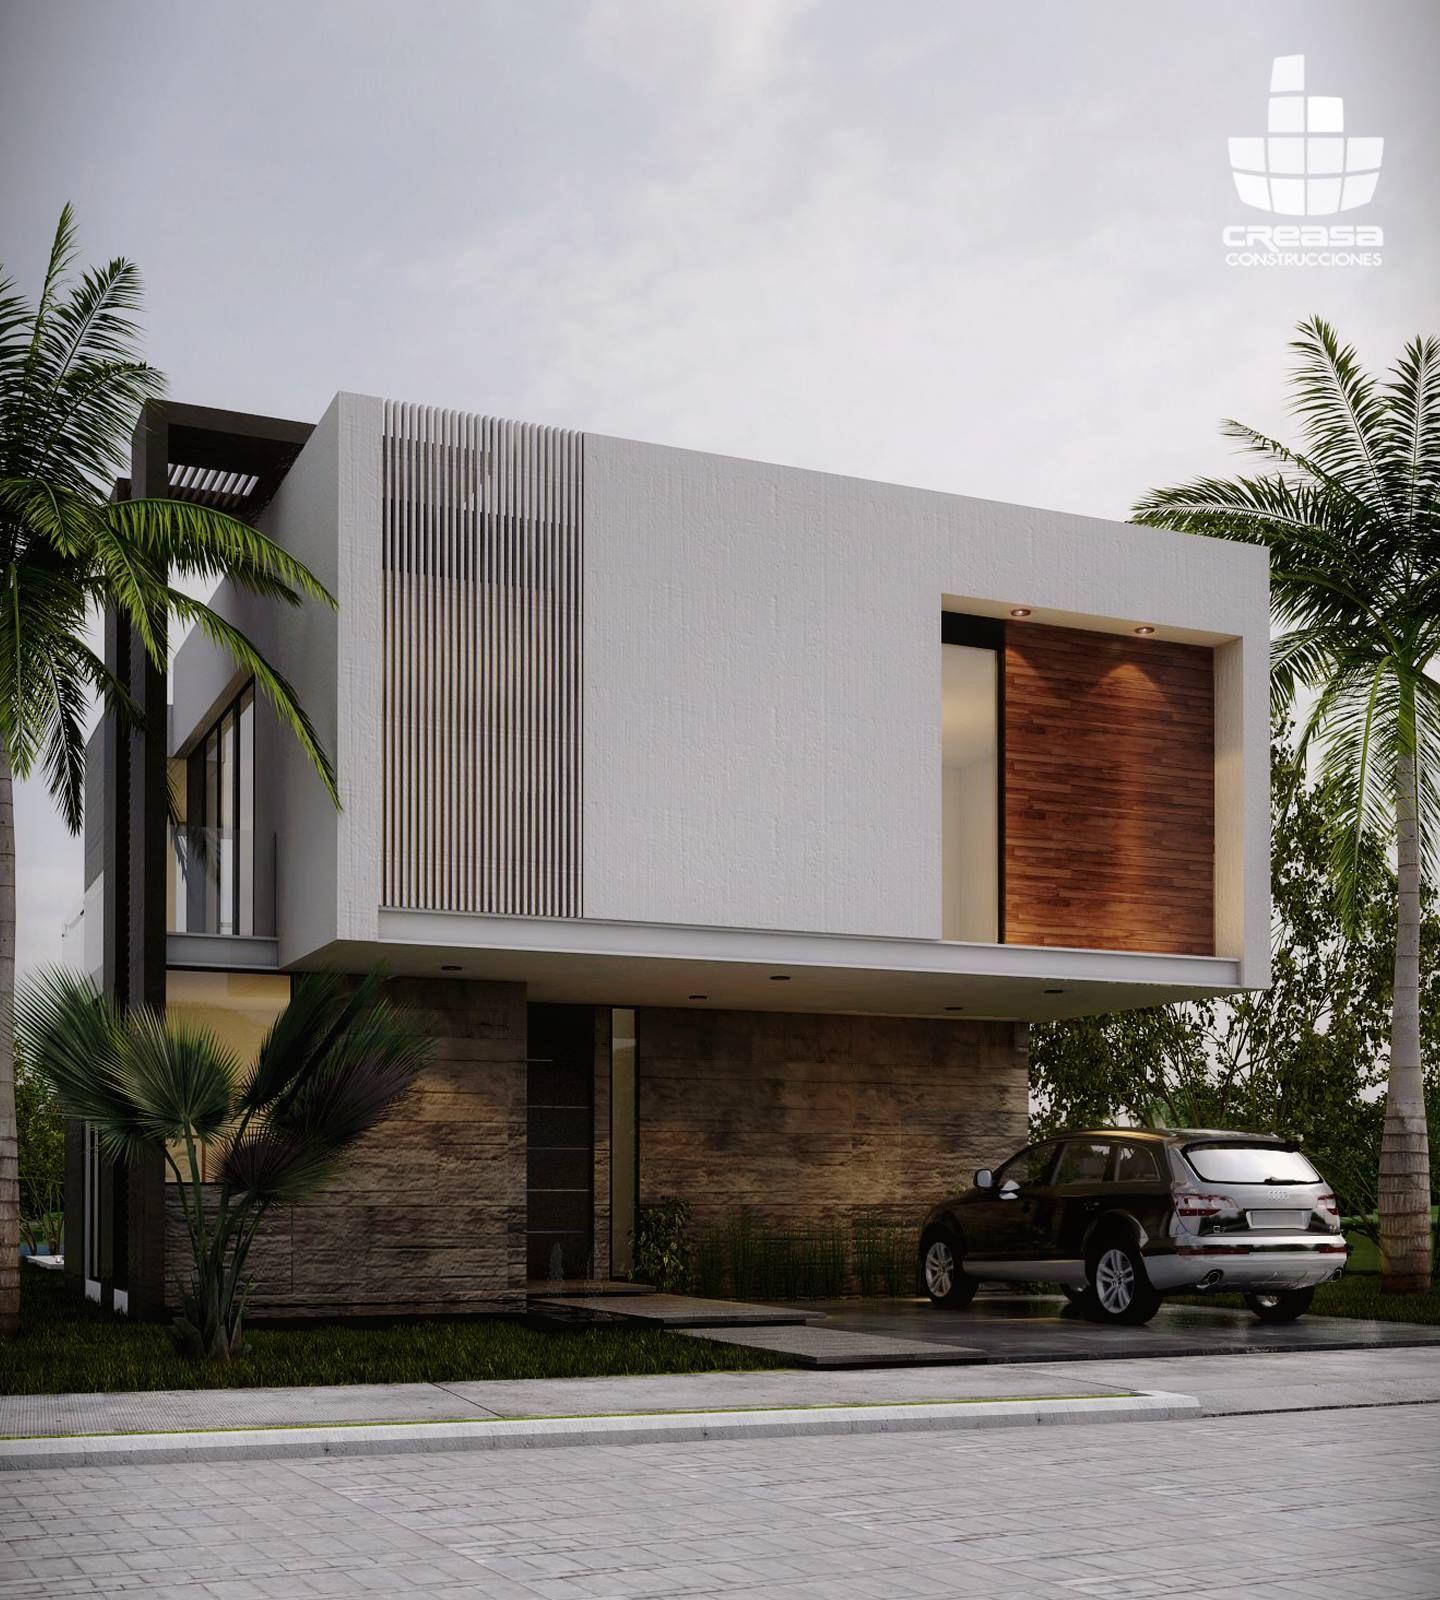 Creasa   Creasa MX   Pinterest   Architecture, House and Modern